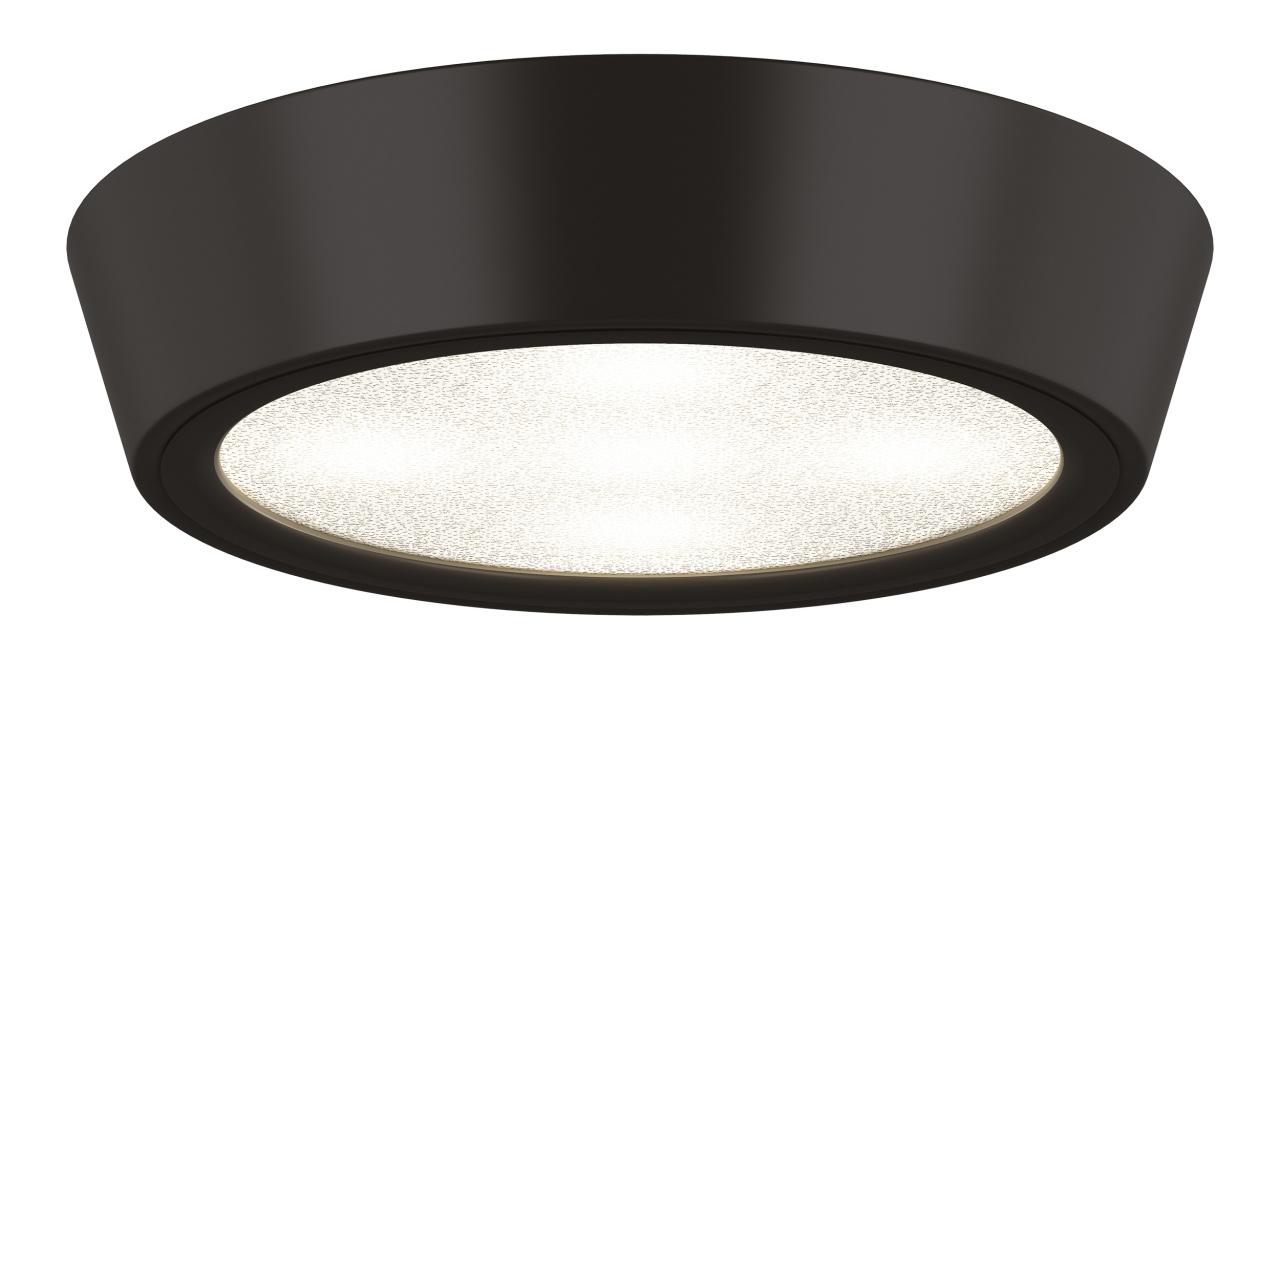 Светильник Urbano Mini LED 8W 770LM черный 3000K IP65 Lightstar 214772